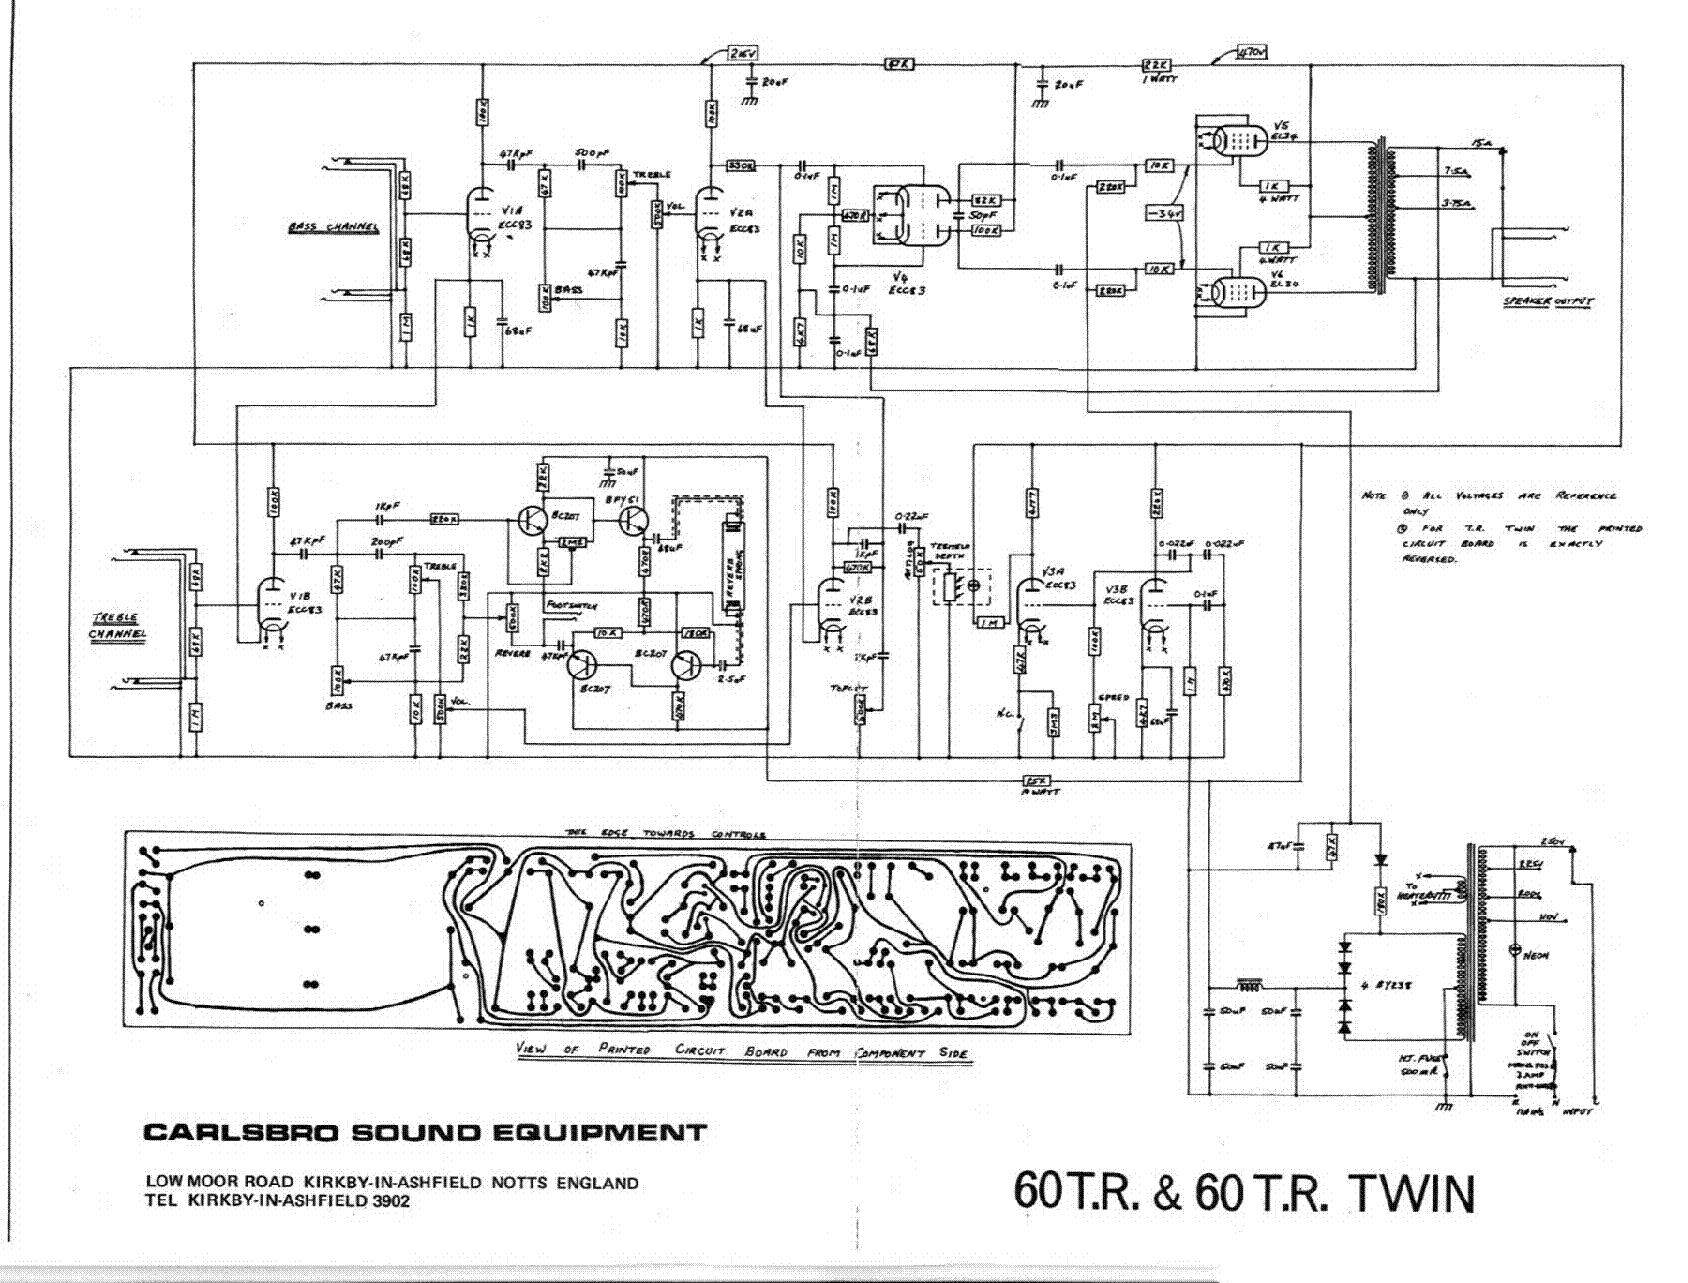 CARLSBRO 60TR 60TR TWIN SCH service manual (1st page)